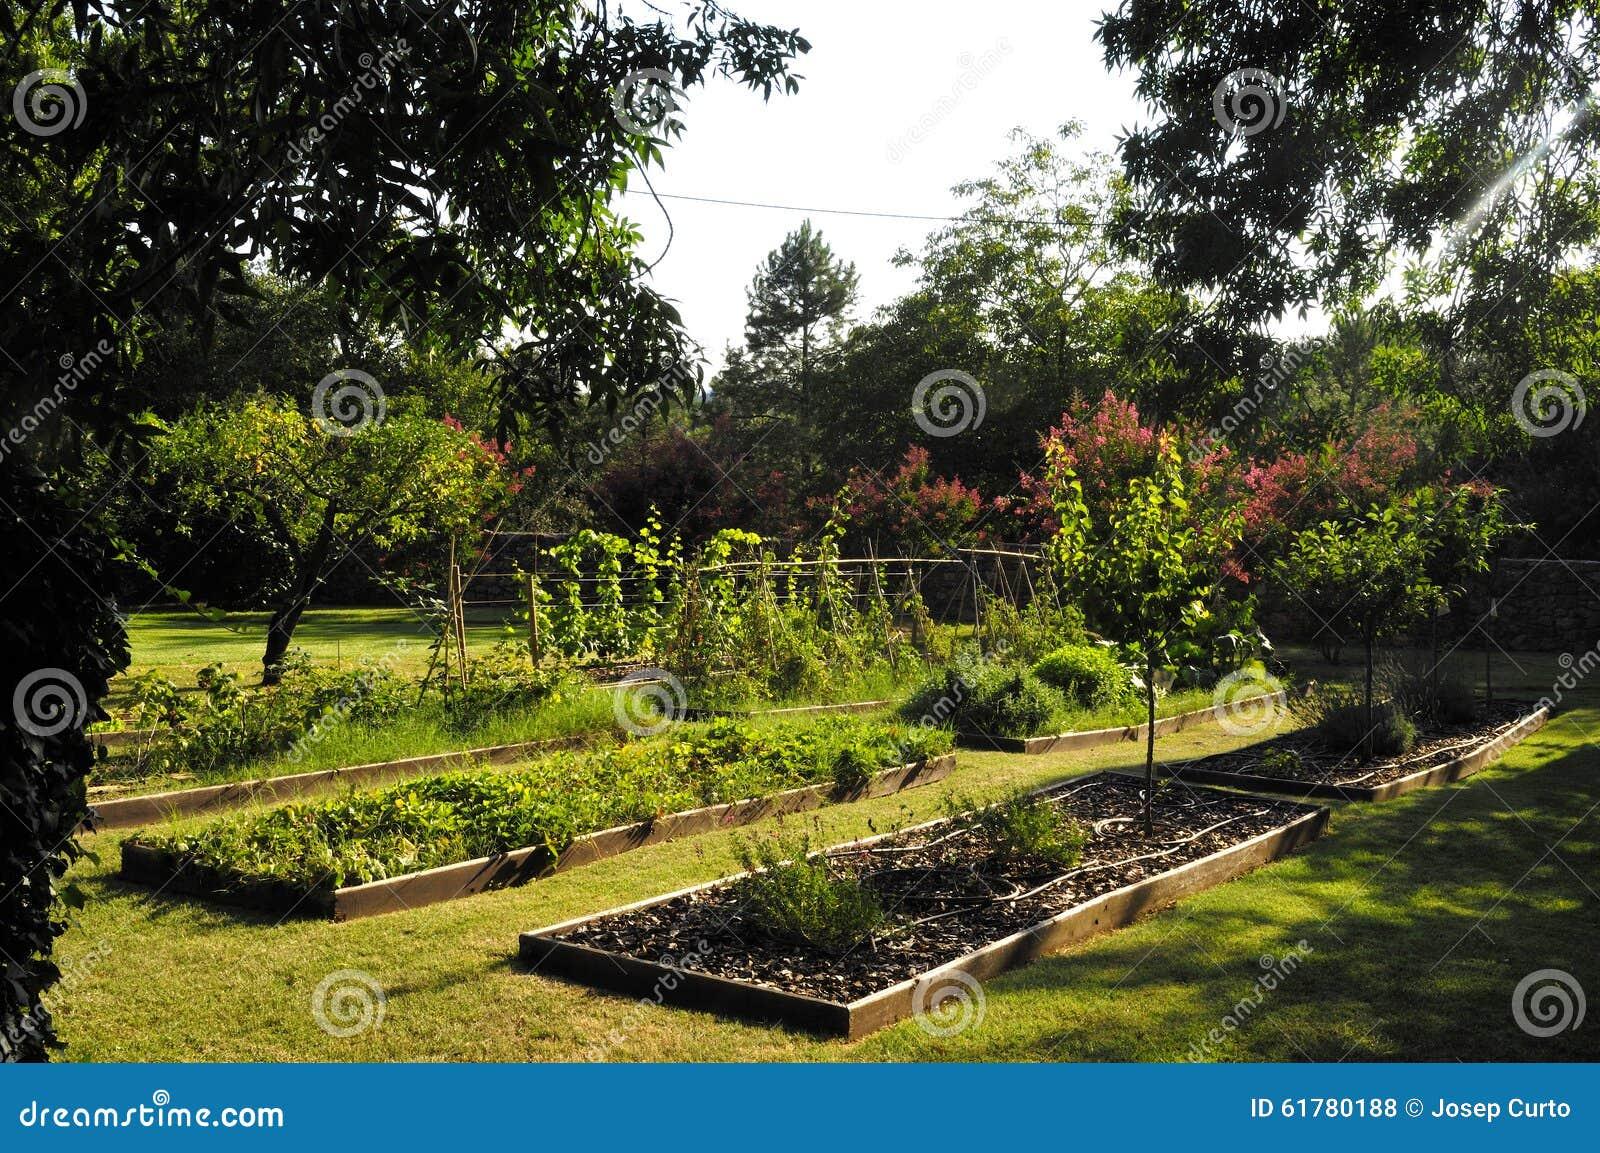 potager beau jardin avec des l gumes photo stock image 61780188. Black Bedroom Furniture Sets. Home Design Ideas